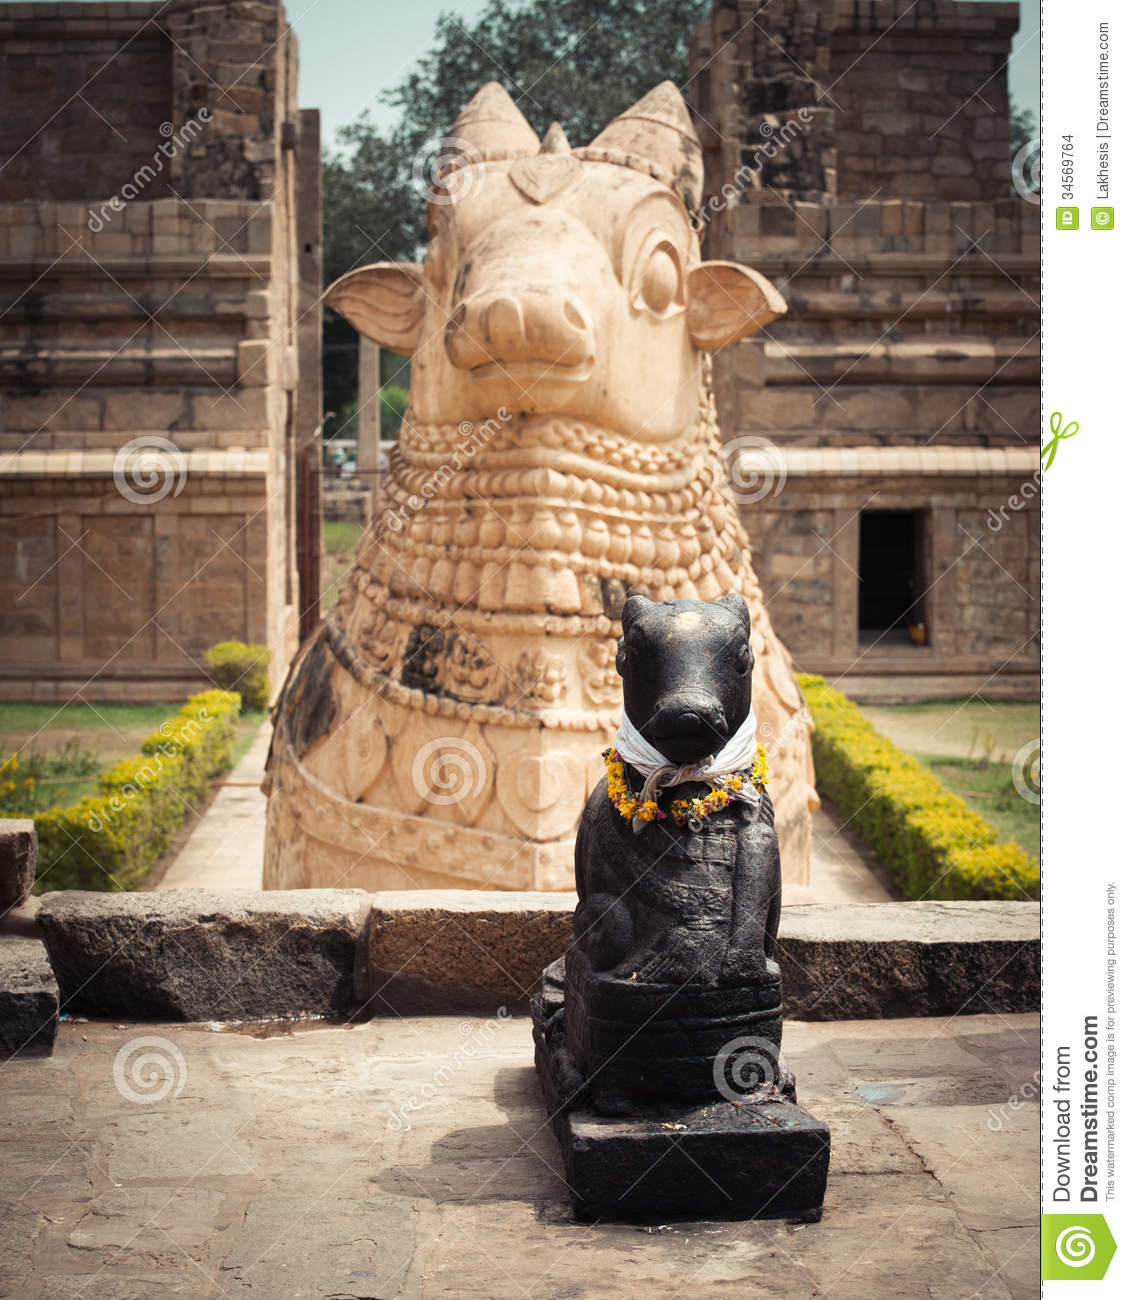 Statue Of Nandi Bull At Hindu Temple. India Stock Images.